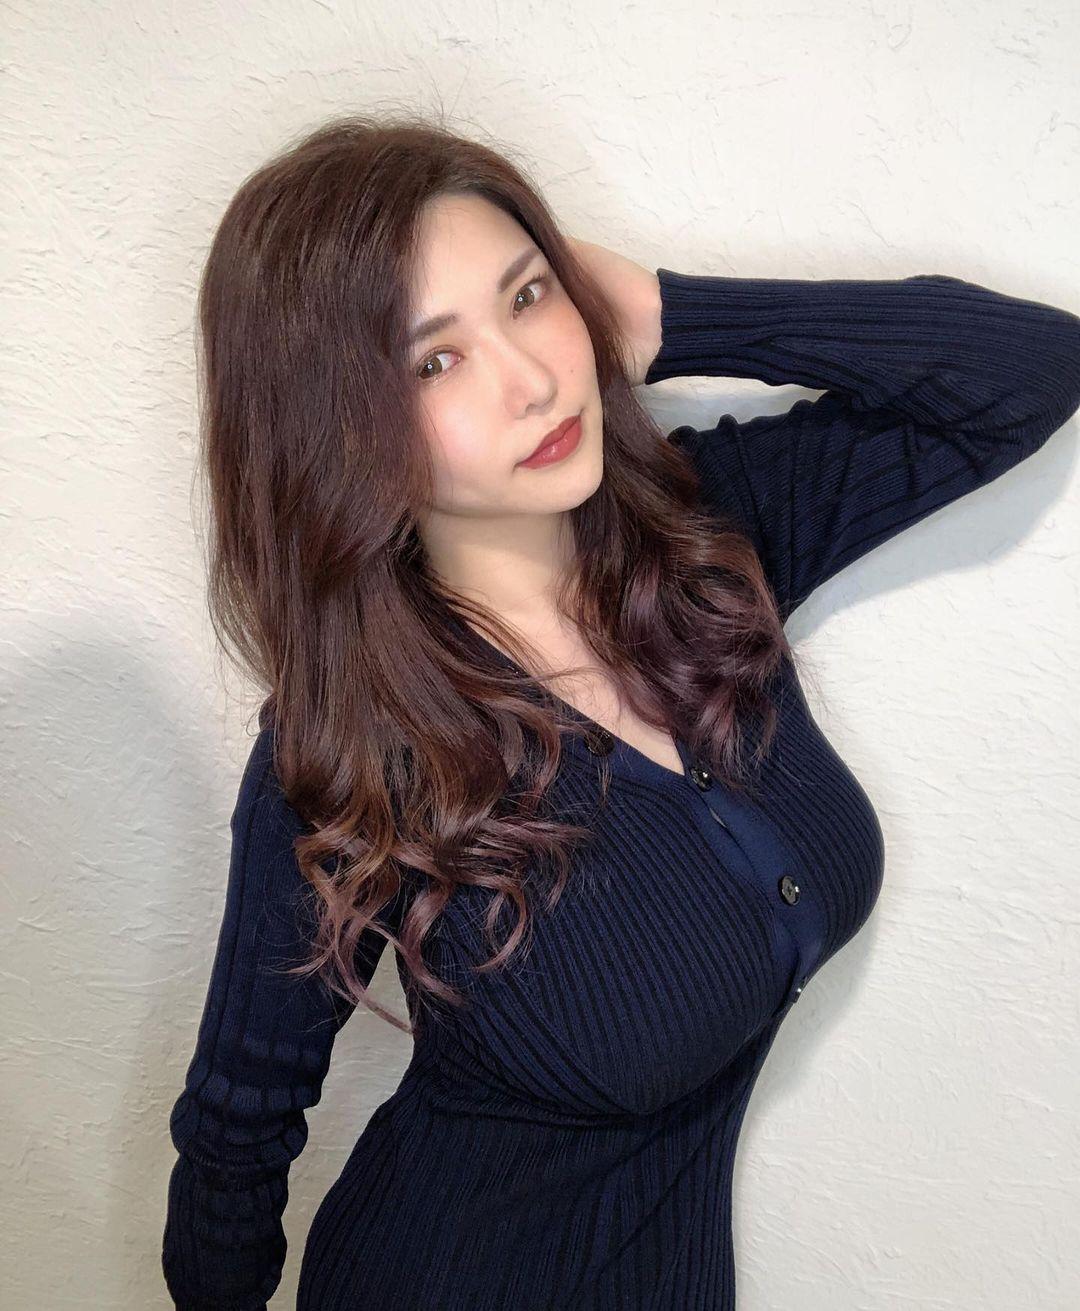 okita_anri151.jpg